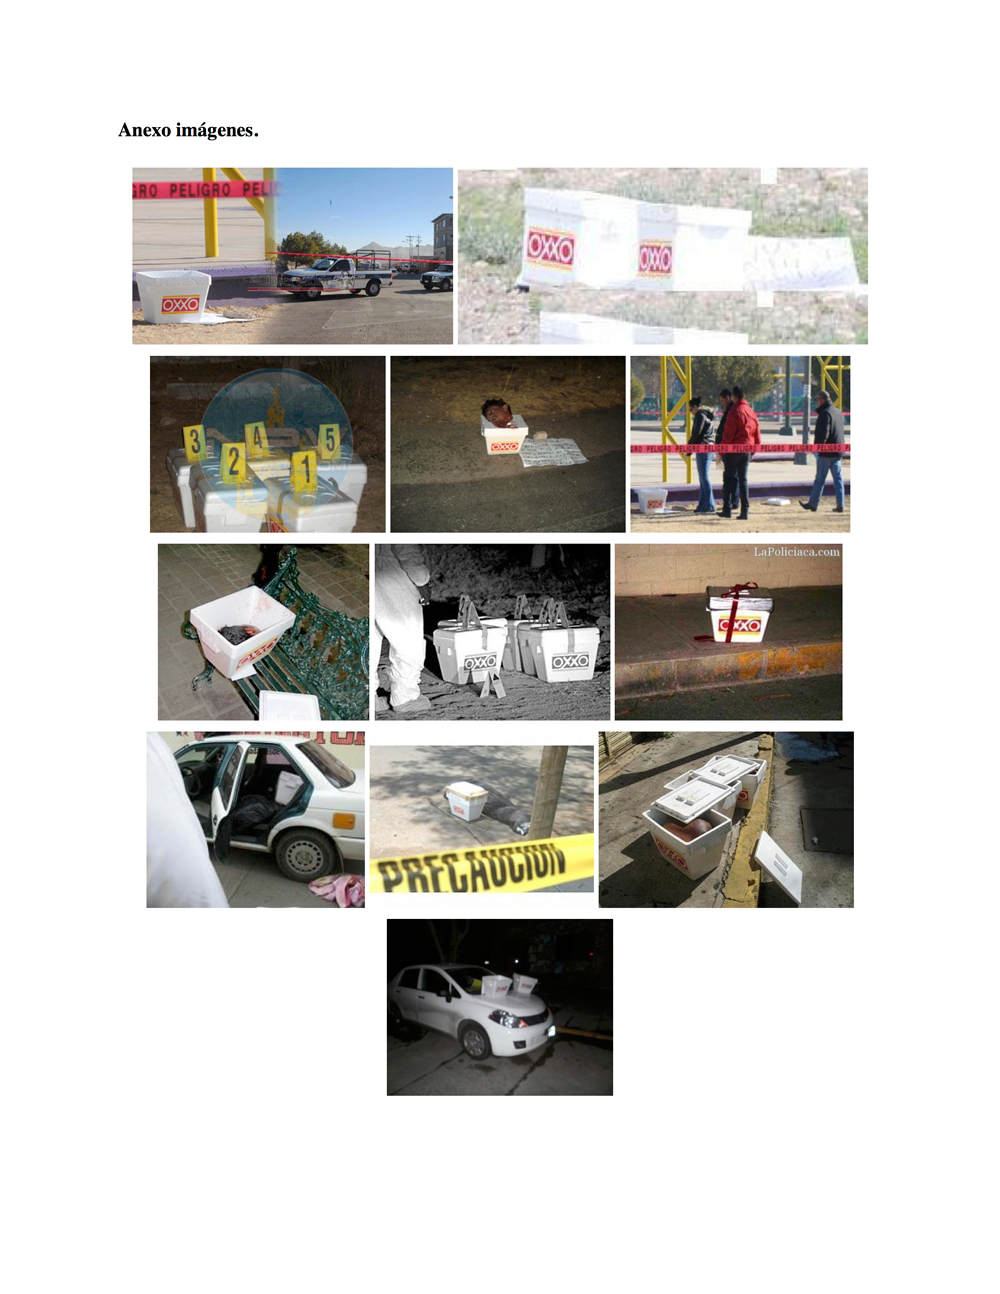 Caja Oxxo (Profanación) , Alejandro Luperca, PDF, 7 págs., 2012.